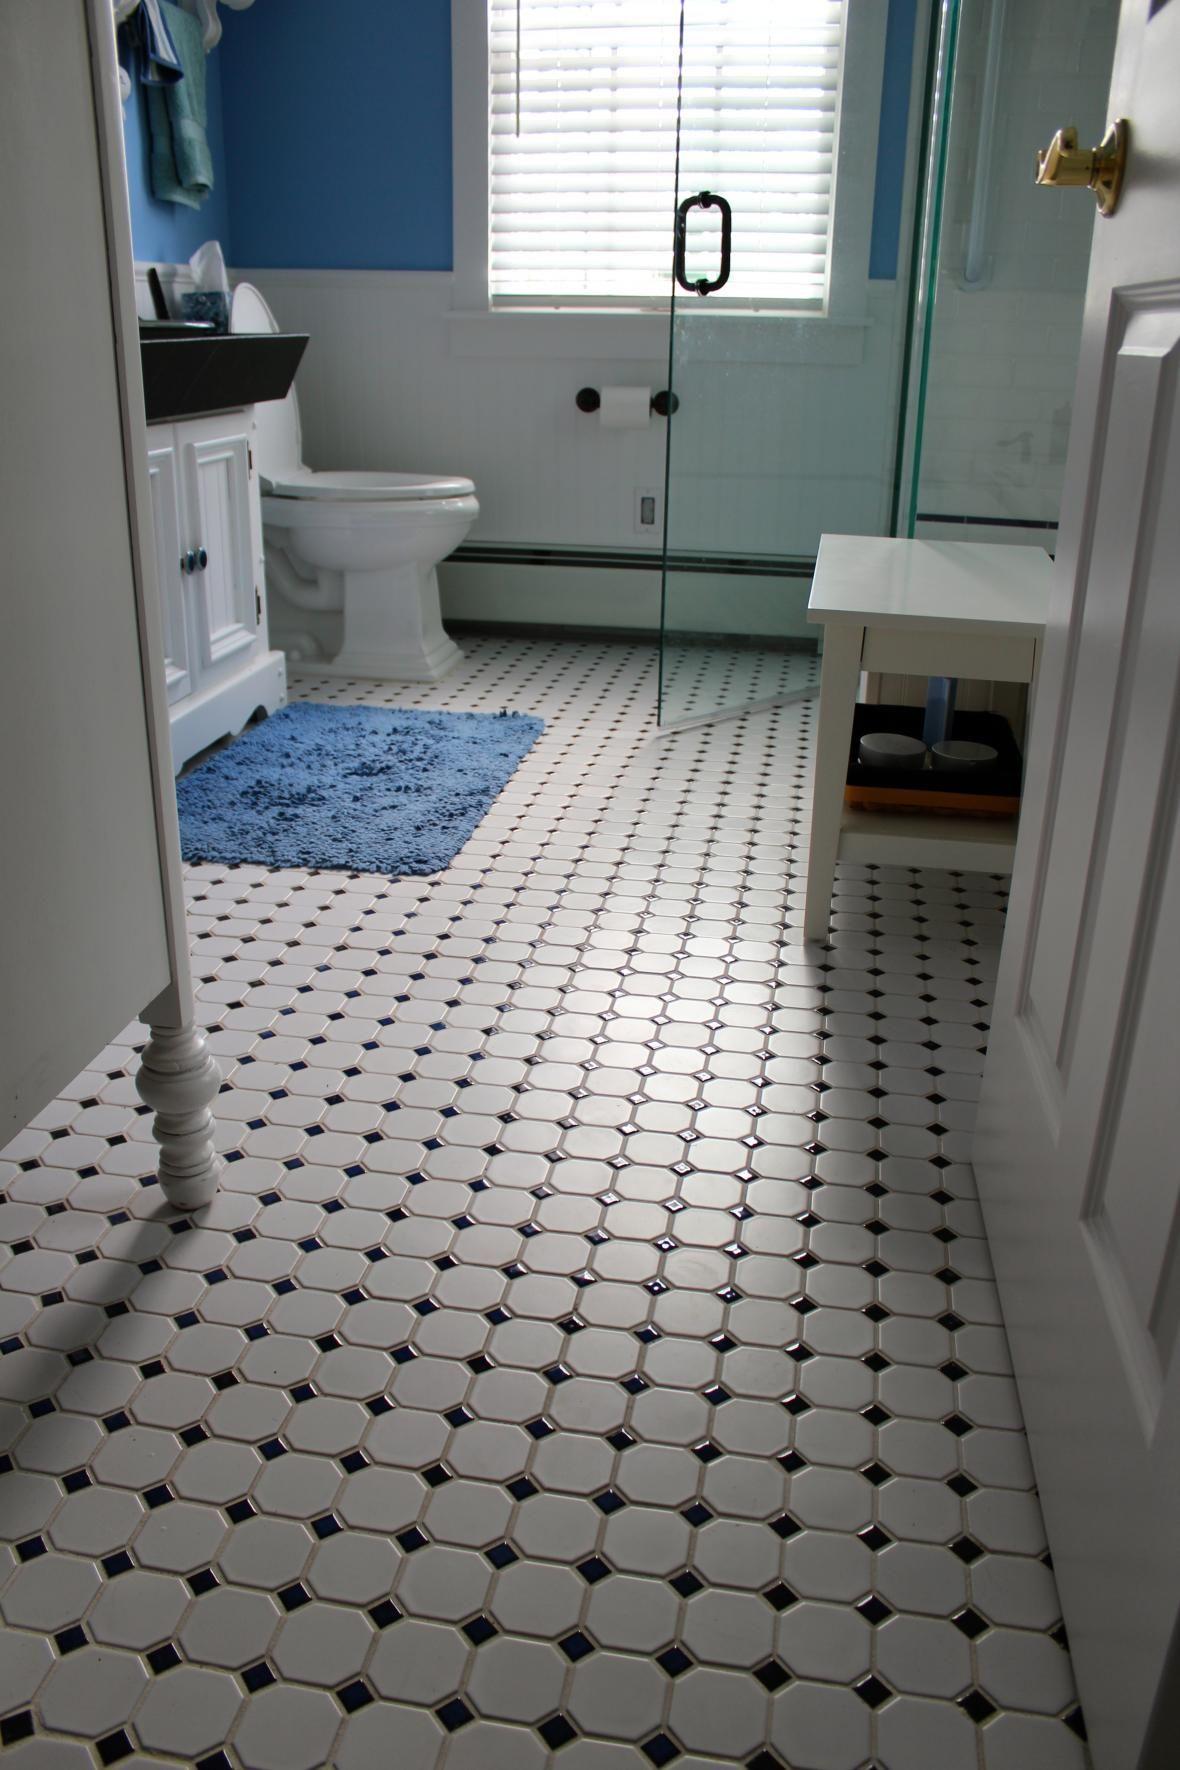 25 Awesome Vintage Bathroom Design Ideas | Bathroom ...